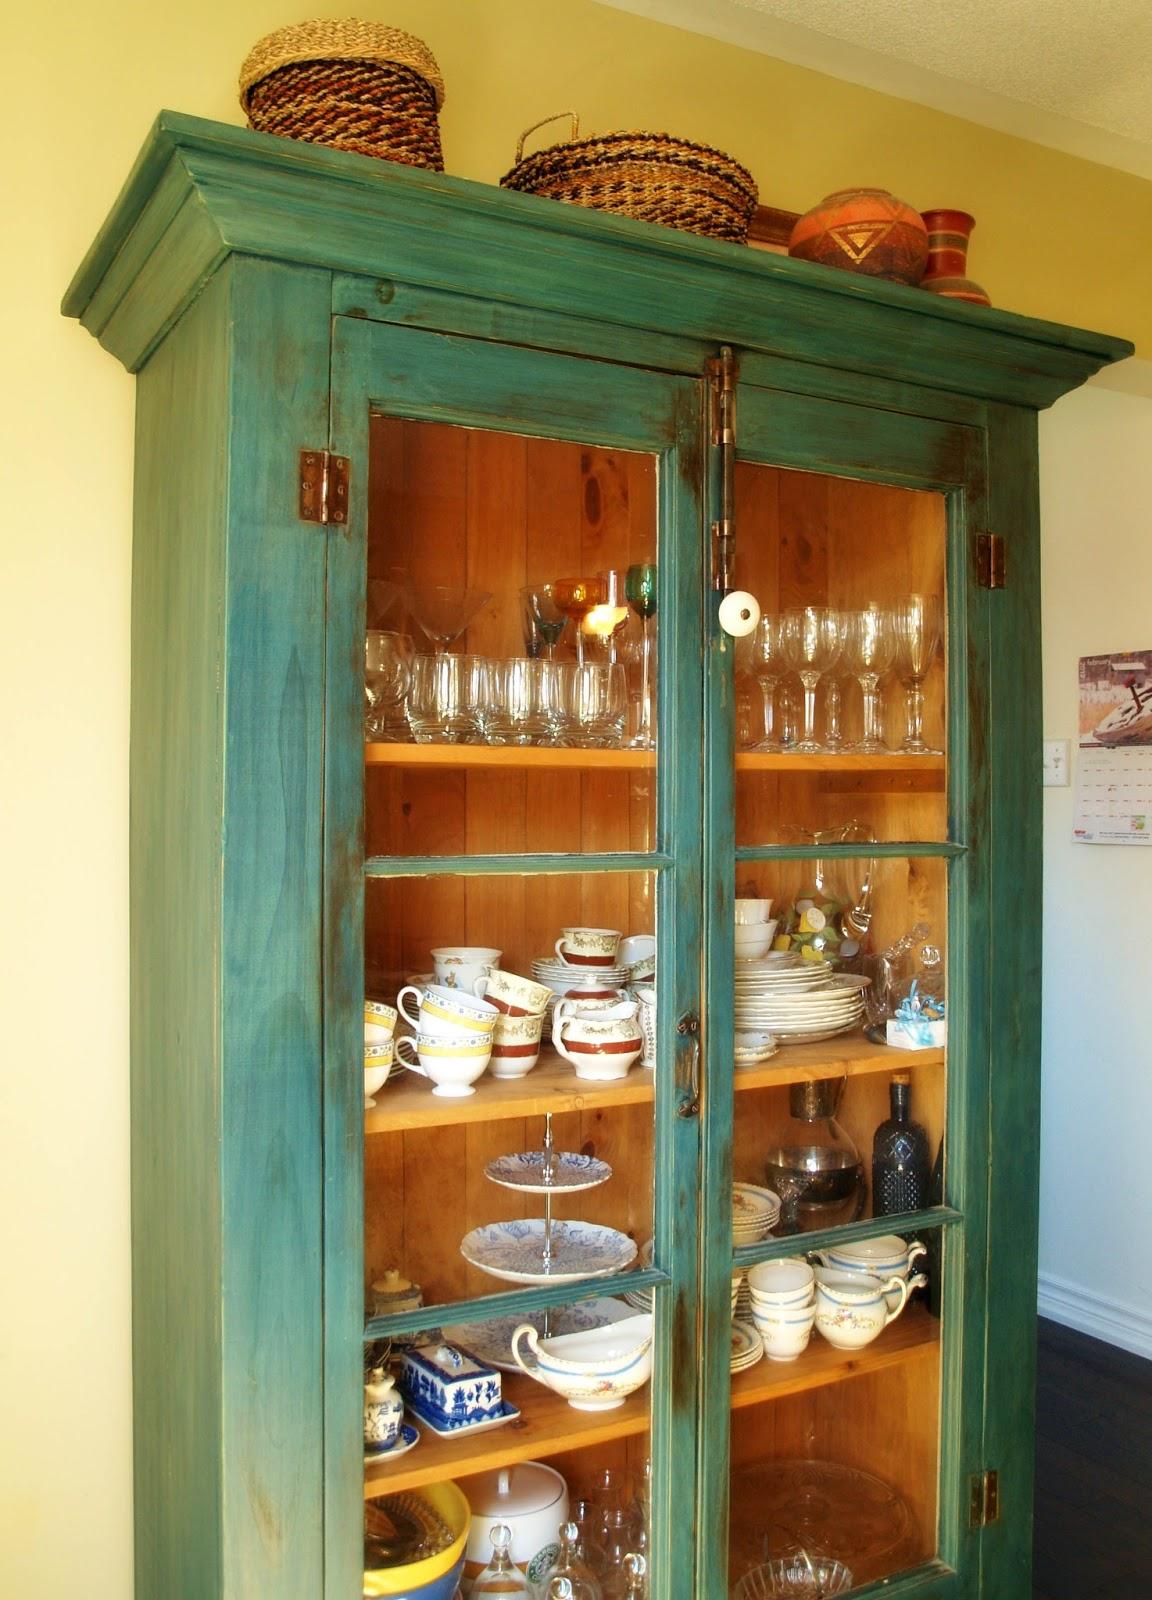 Best Auction Room For Teasets